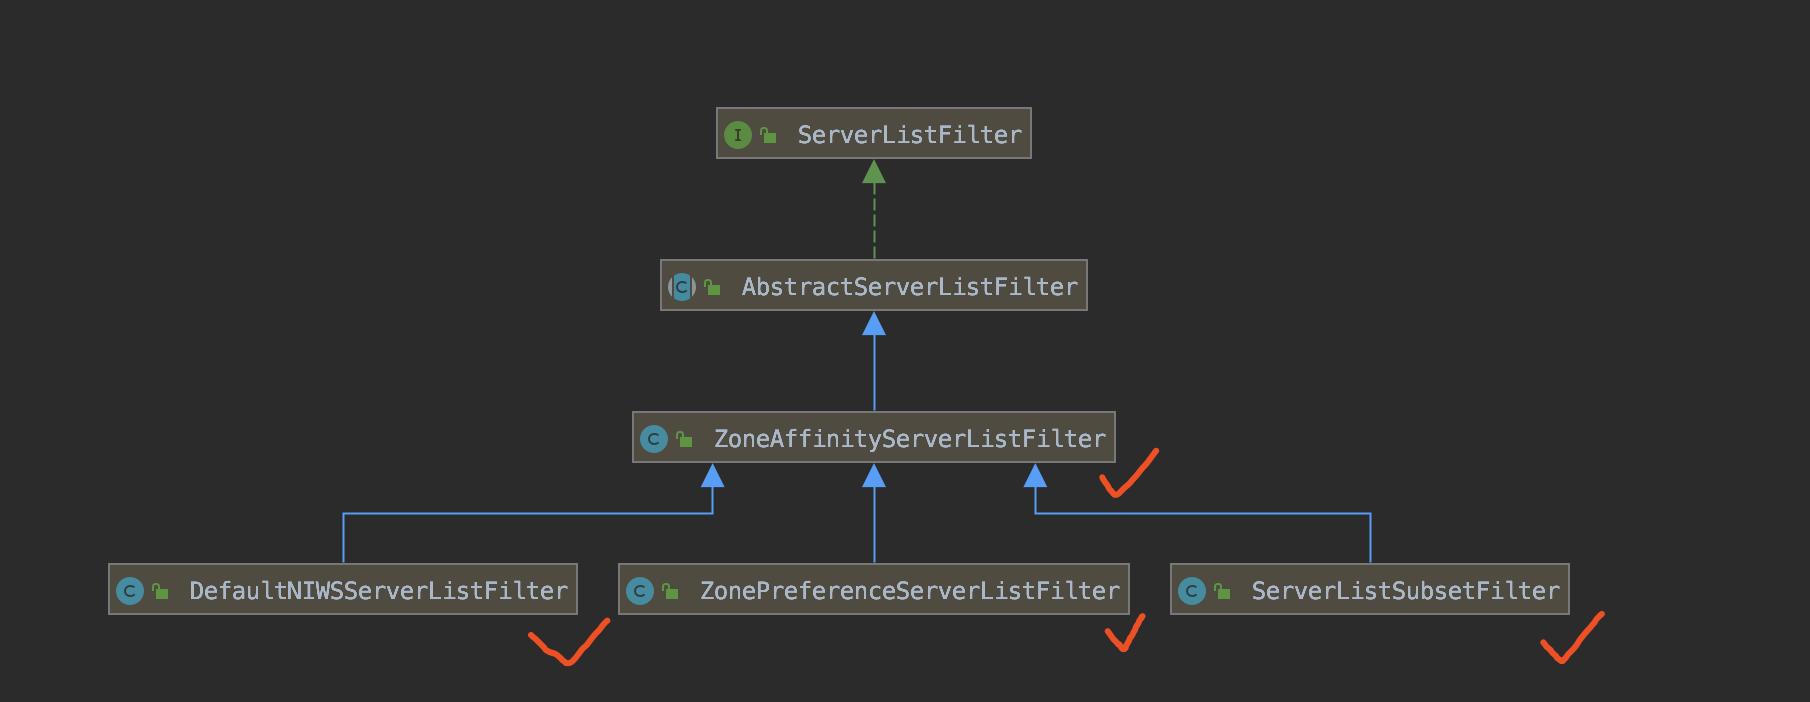 ServerListFilter 类图